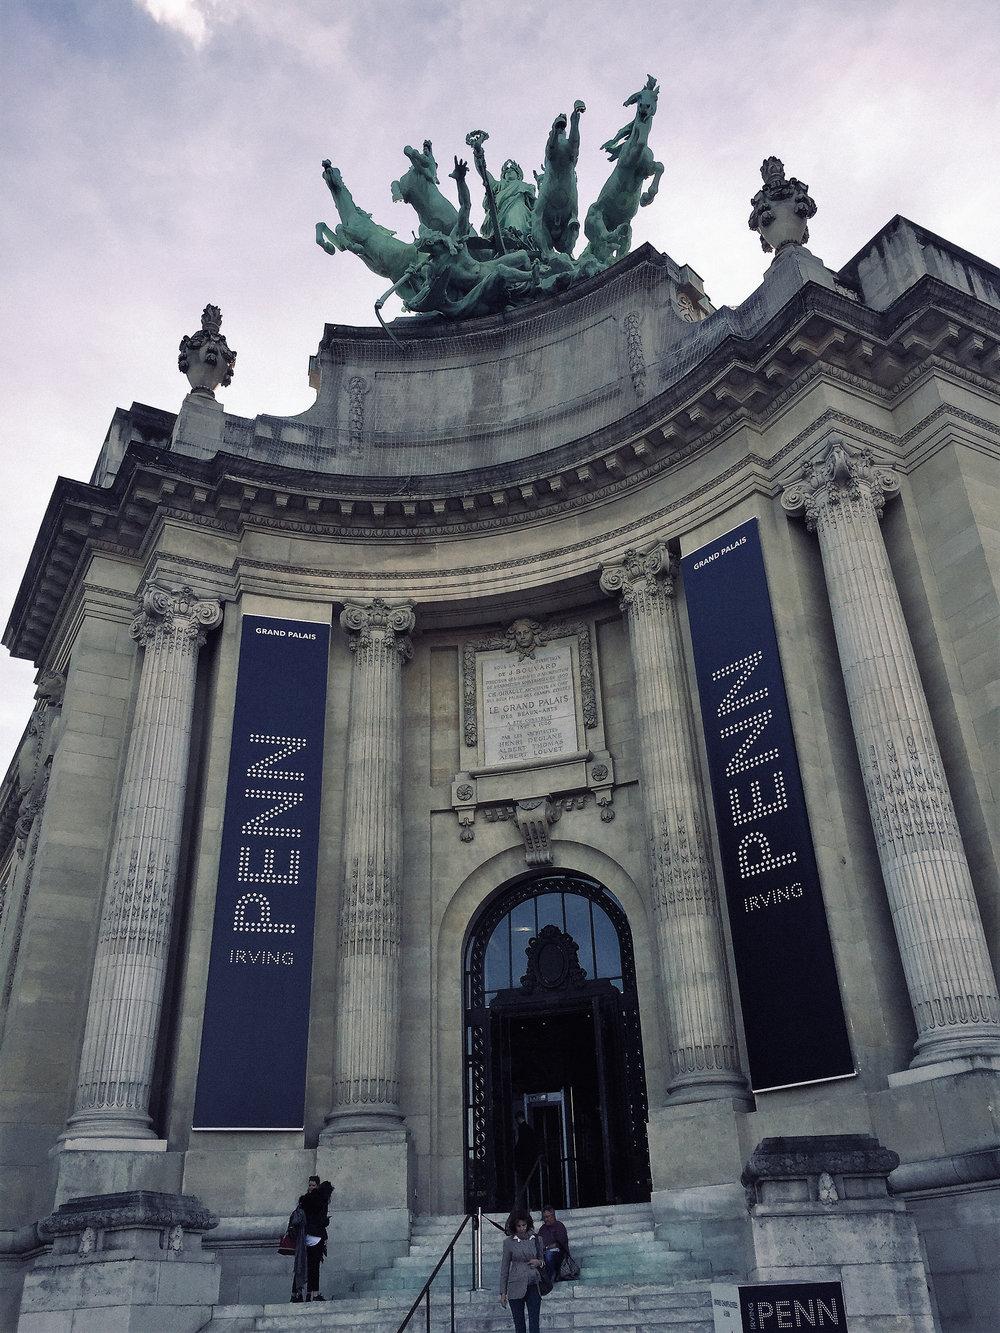 Centenary Exhibition - Grand Palais Paris - September 21. 2017 - January 29. 2018